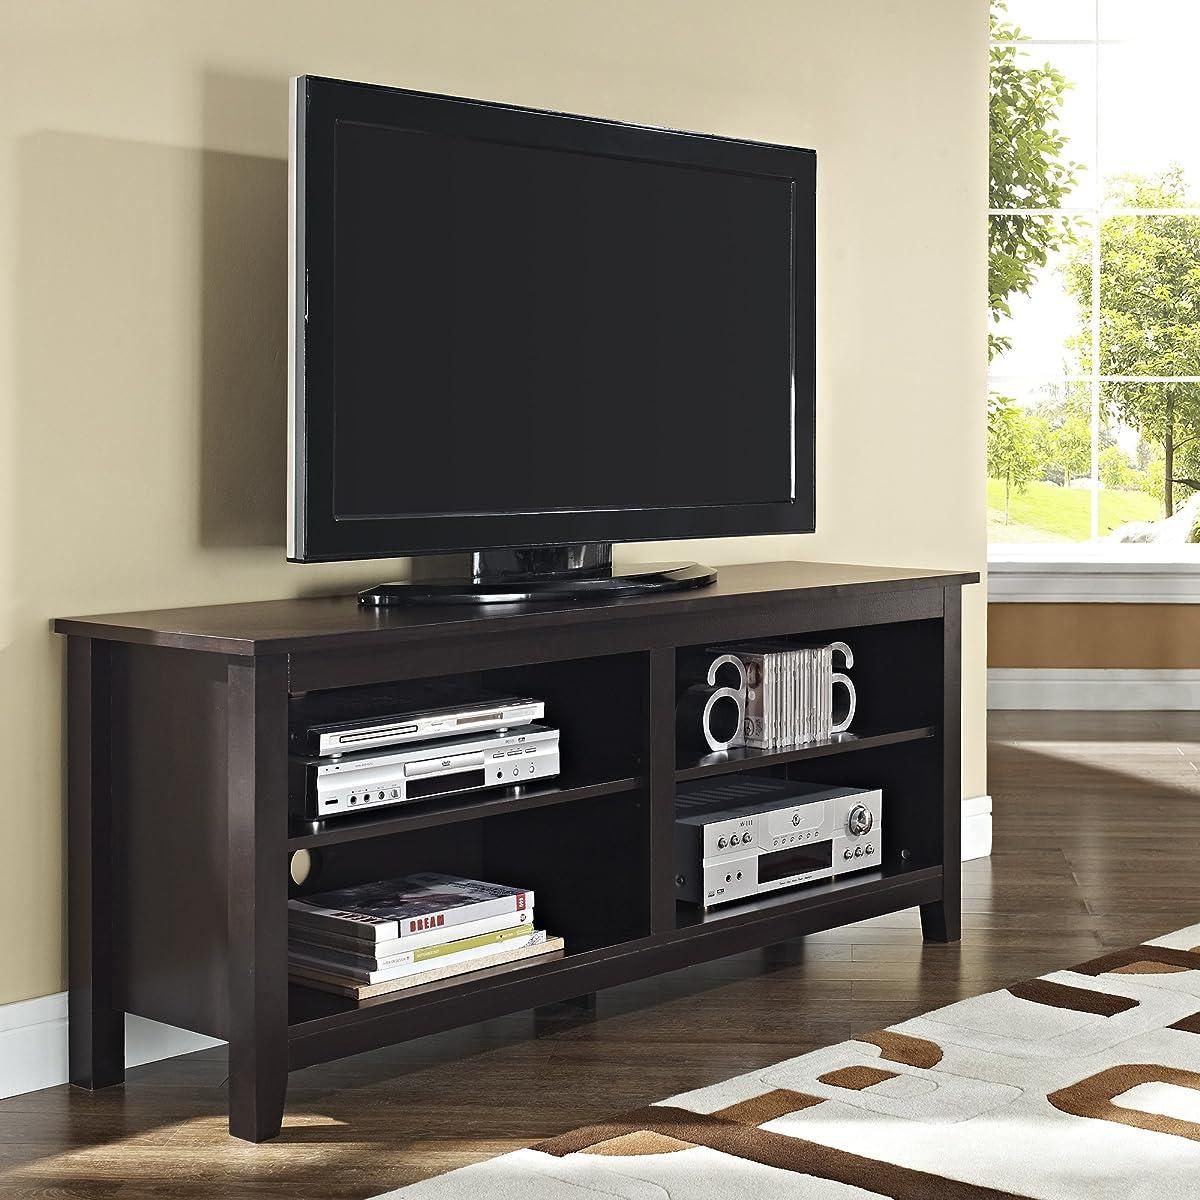 "WE Furniture 58"" Wood TV Stand Storage Console, Espresso"